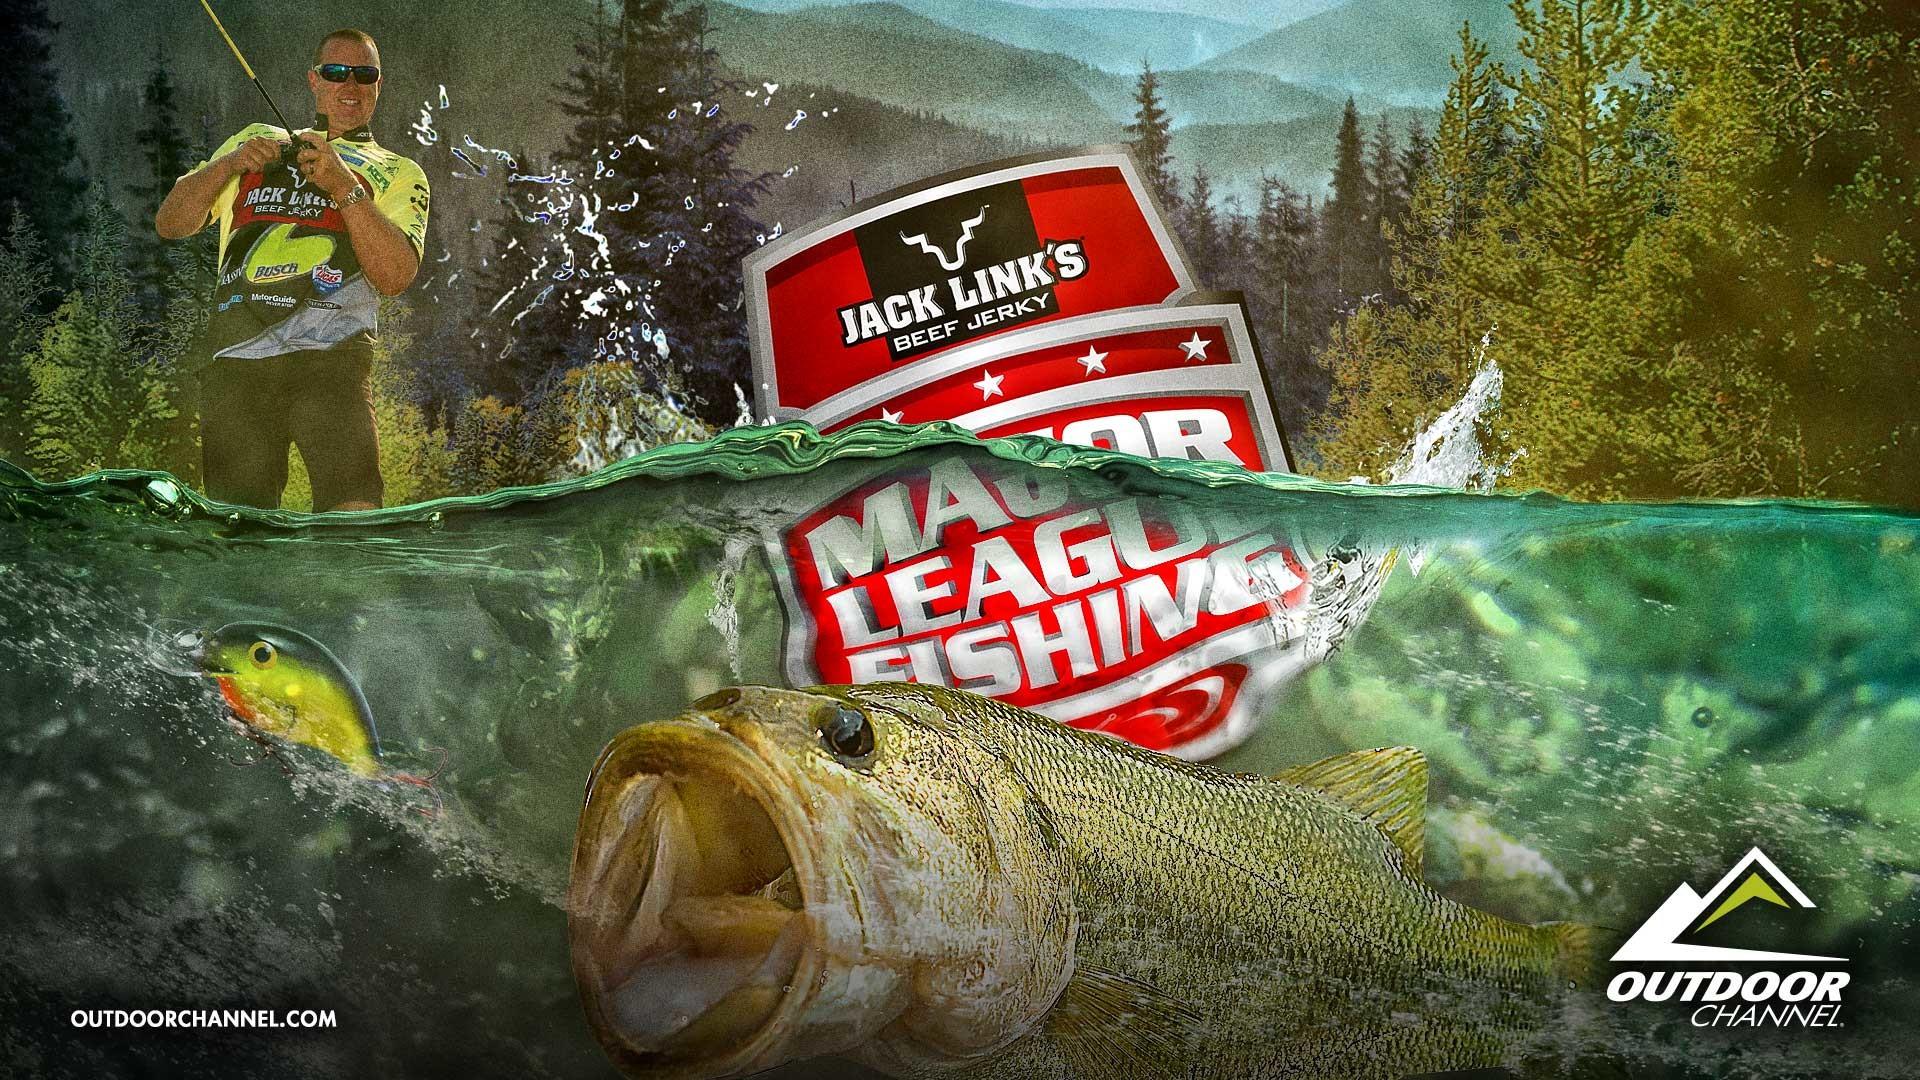 Major League Fishing telecast draws 1.1 million viewers | Muskie Fishing